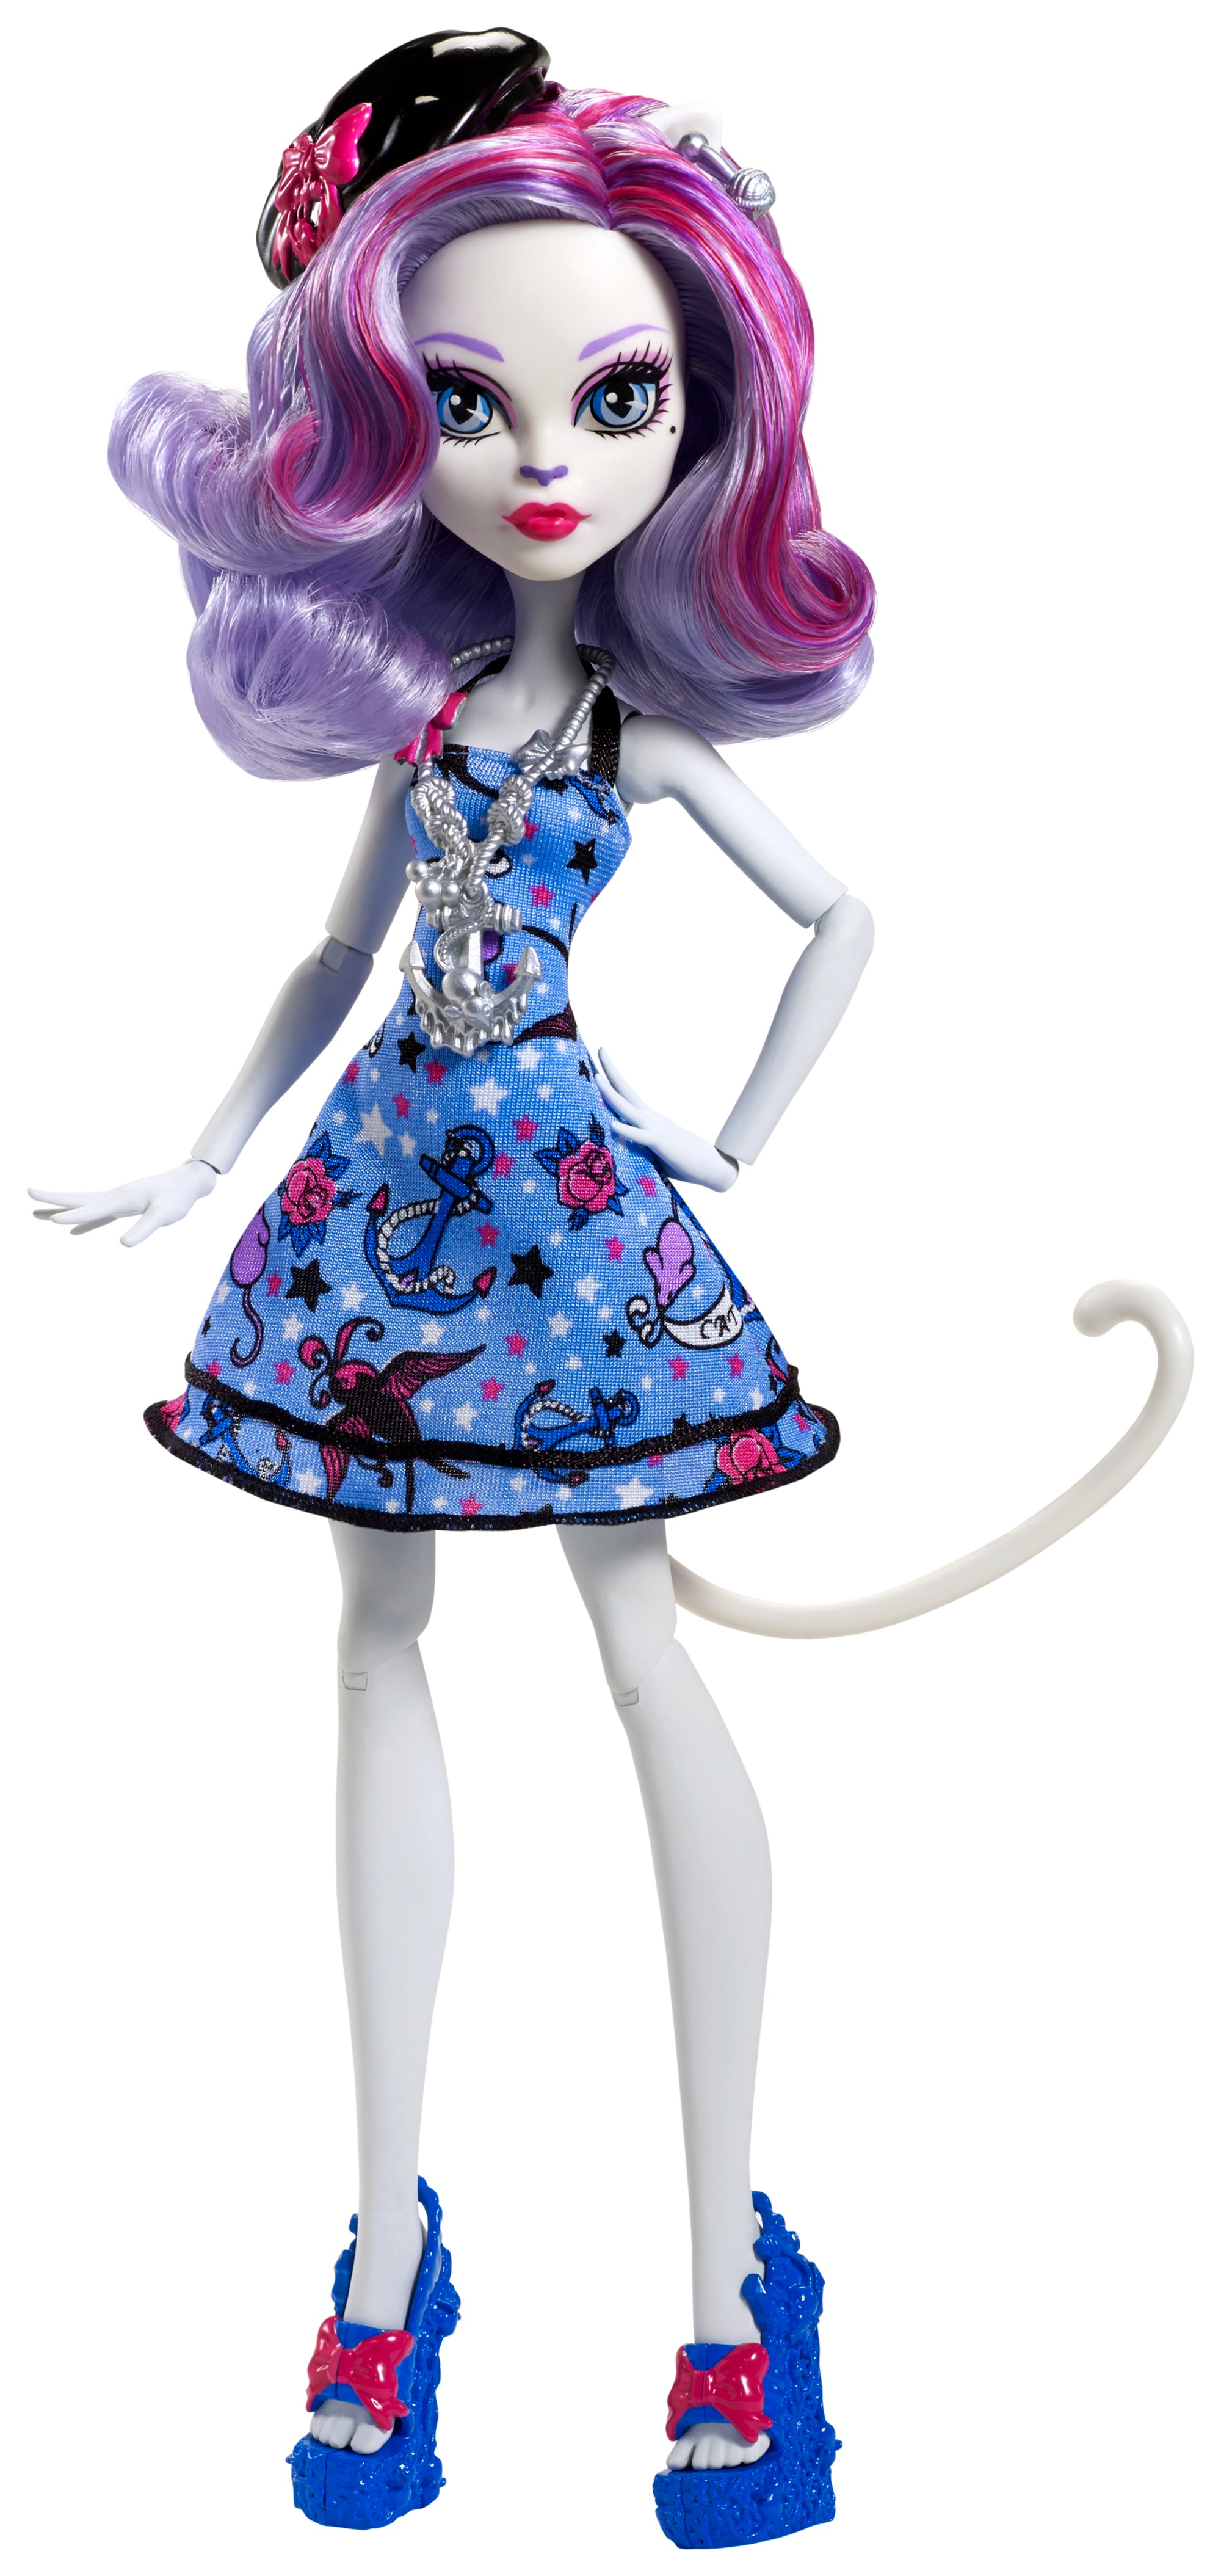 Catrine demew popular catrine demew doll buy cheap catrine demew doll - Monster High Shriekwrecked Shriek Mates Catrine Demew Doll Walmart Com